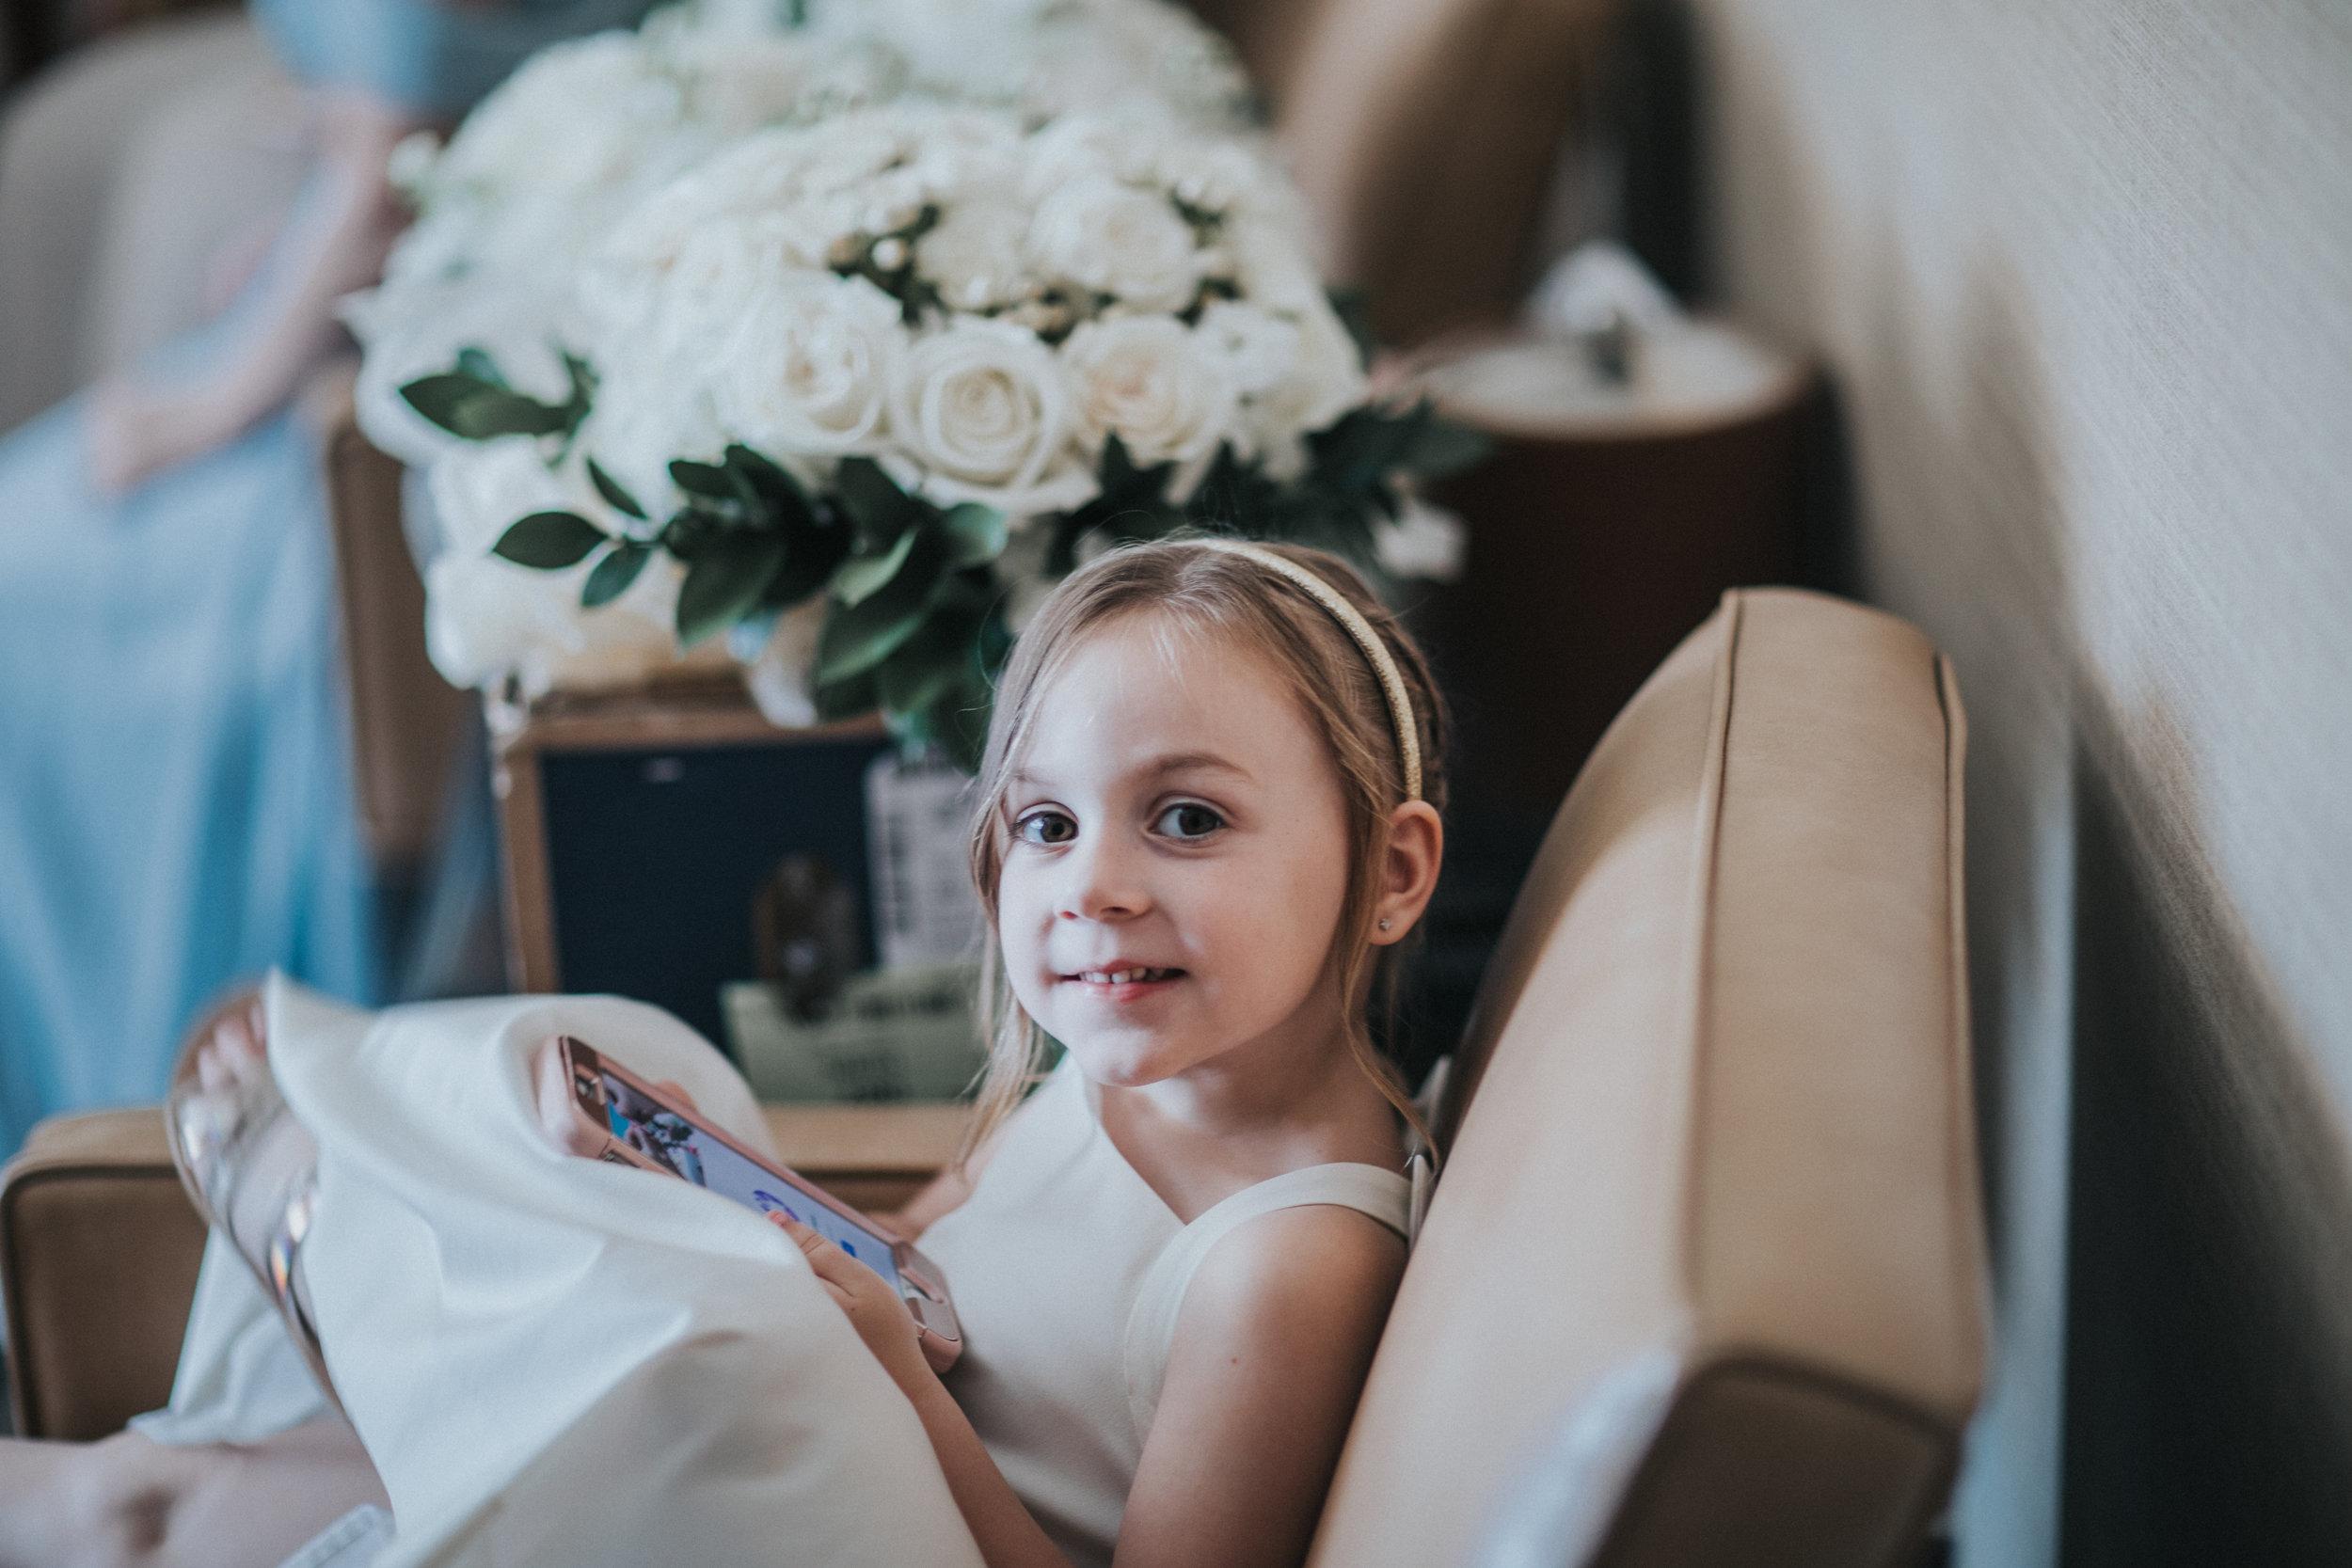 JennaLynnPhotography-NJWeddingPhotographer-Wedding-TheBerkeley-AsburyPark-Allison&Michael-GettingReady-80.jpg